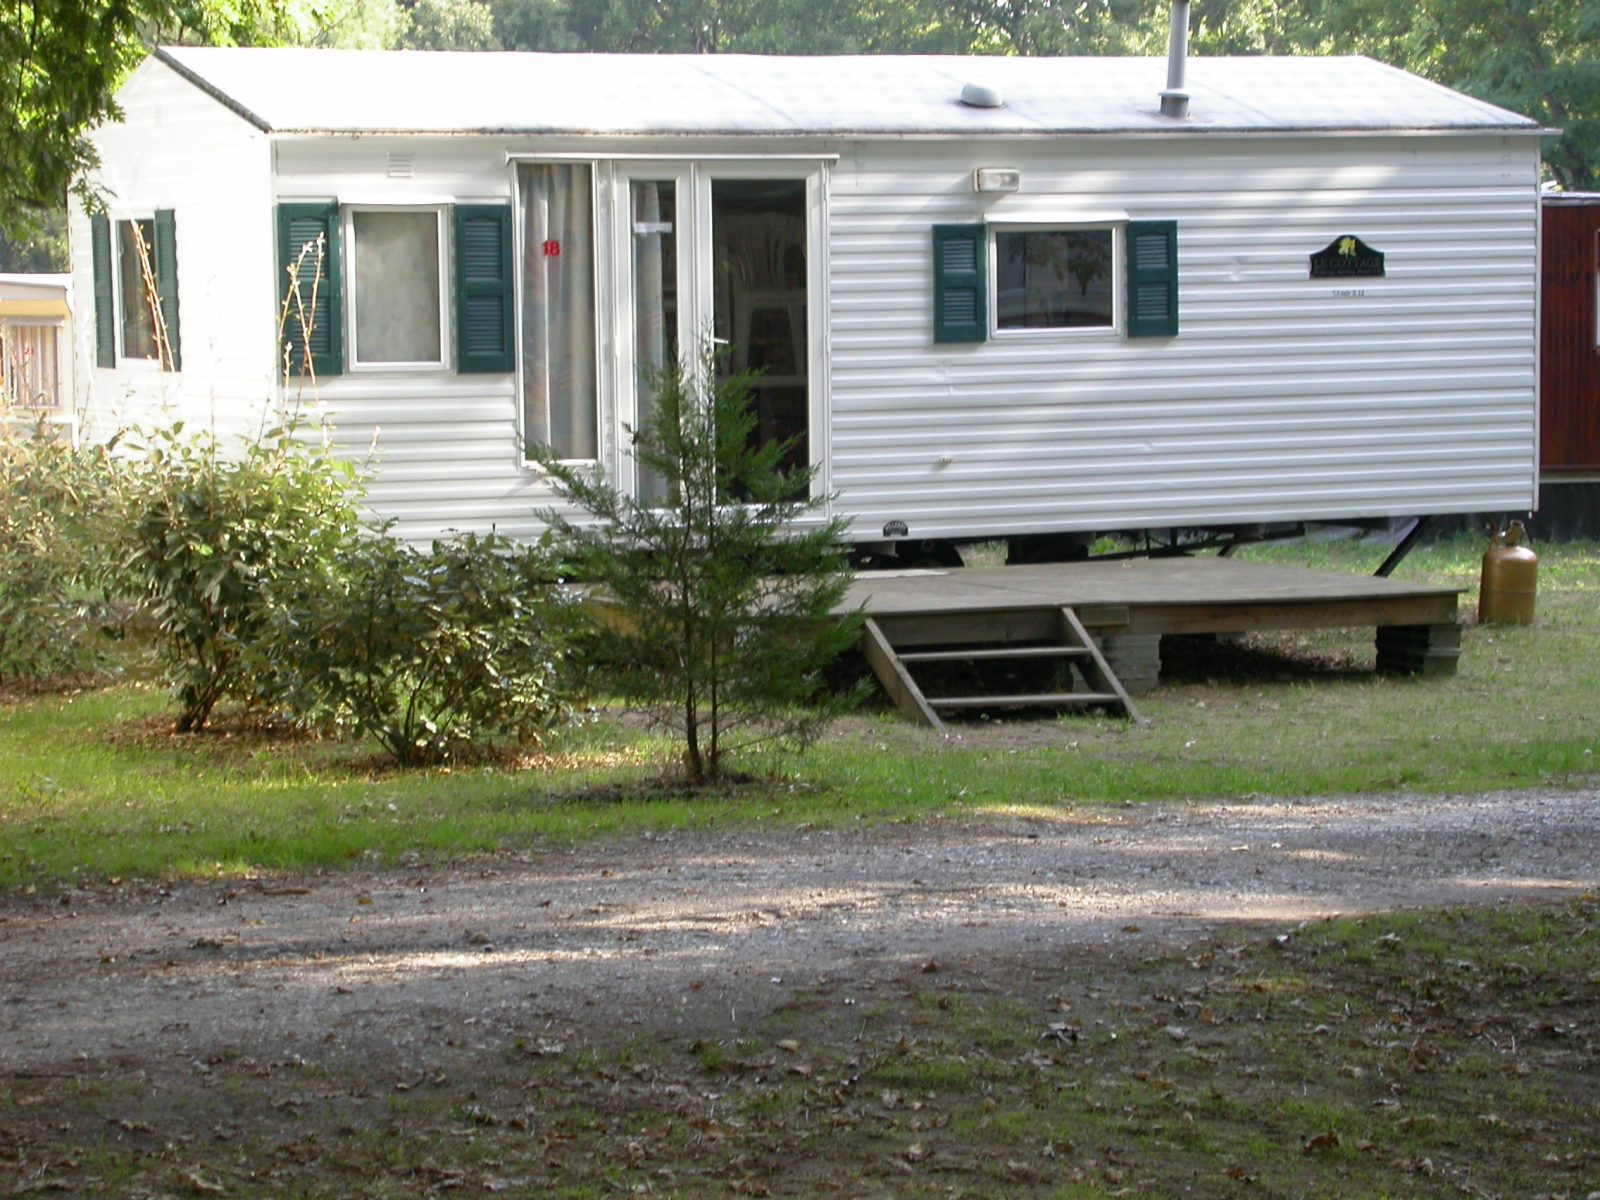 Camping-VAE-Photo-Mobilhome